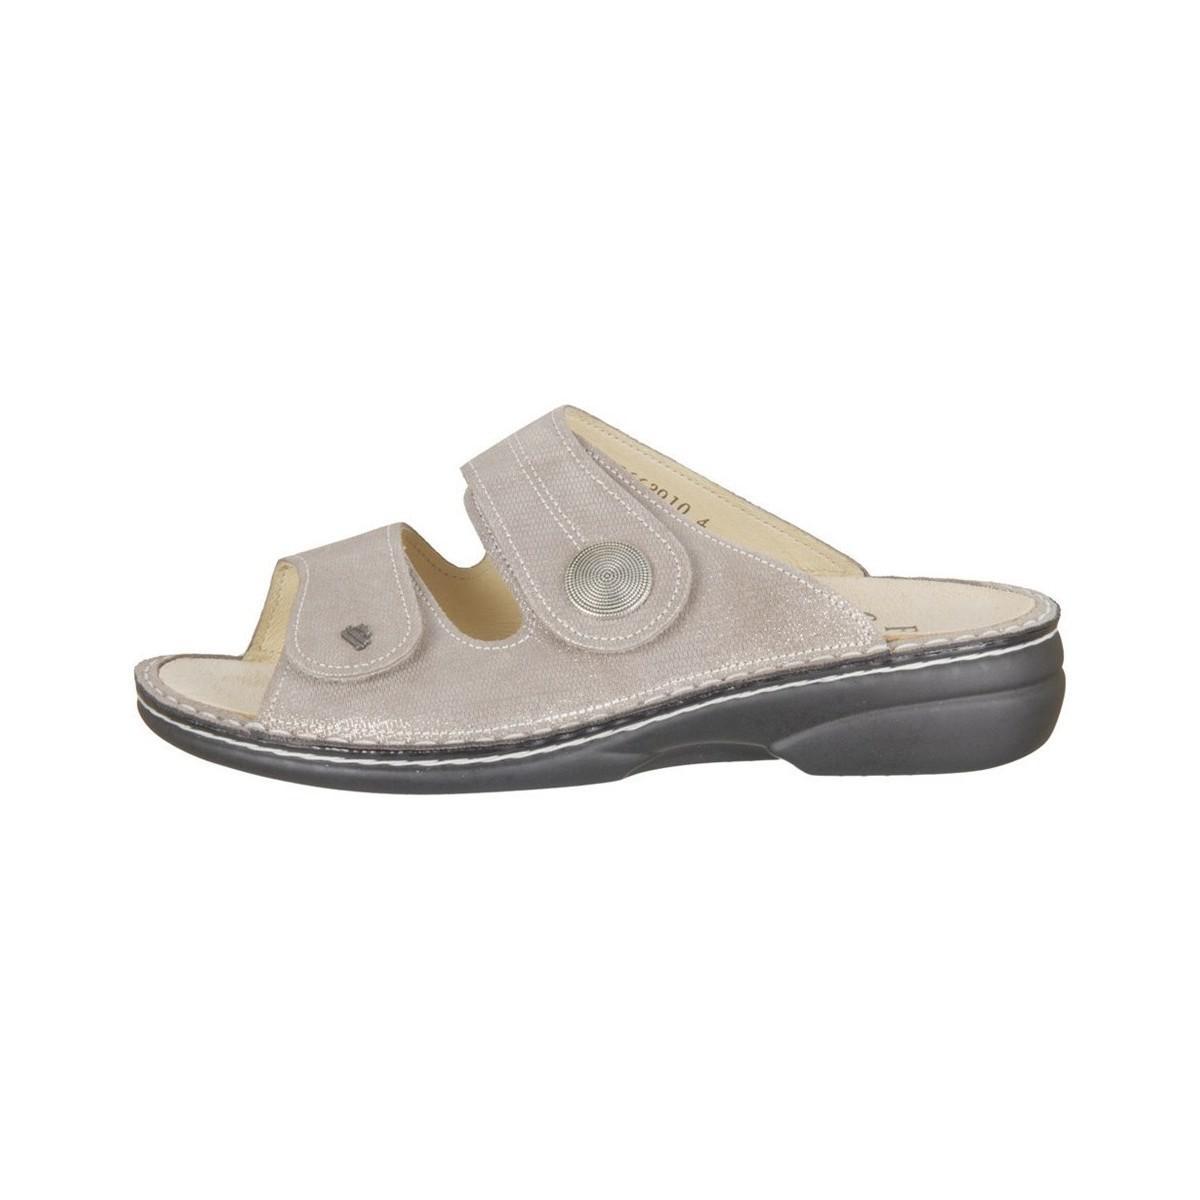 Finn Sansibar Fango Campagnolo women's Mules / Casual Shoes in Cheap Sale Fake Buy Cheap Get Authentic Buy Cheap Low Price Fee Shipping RLz215q